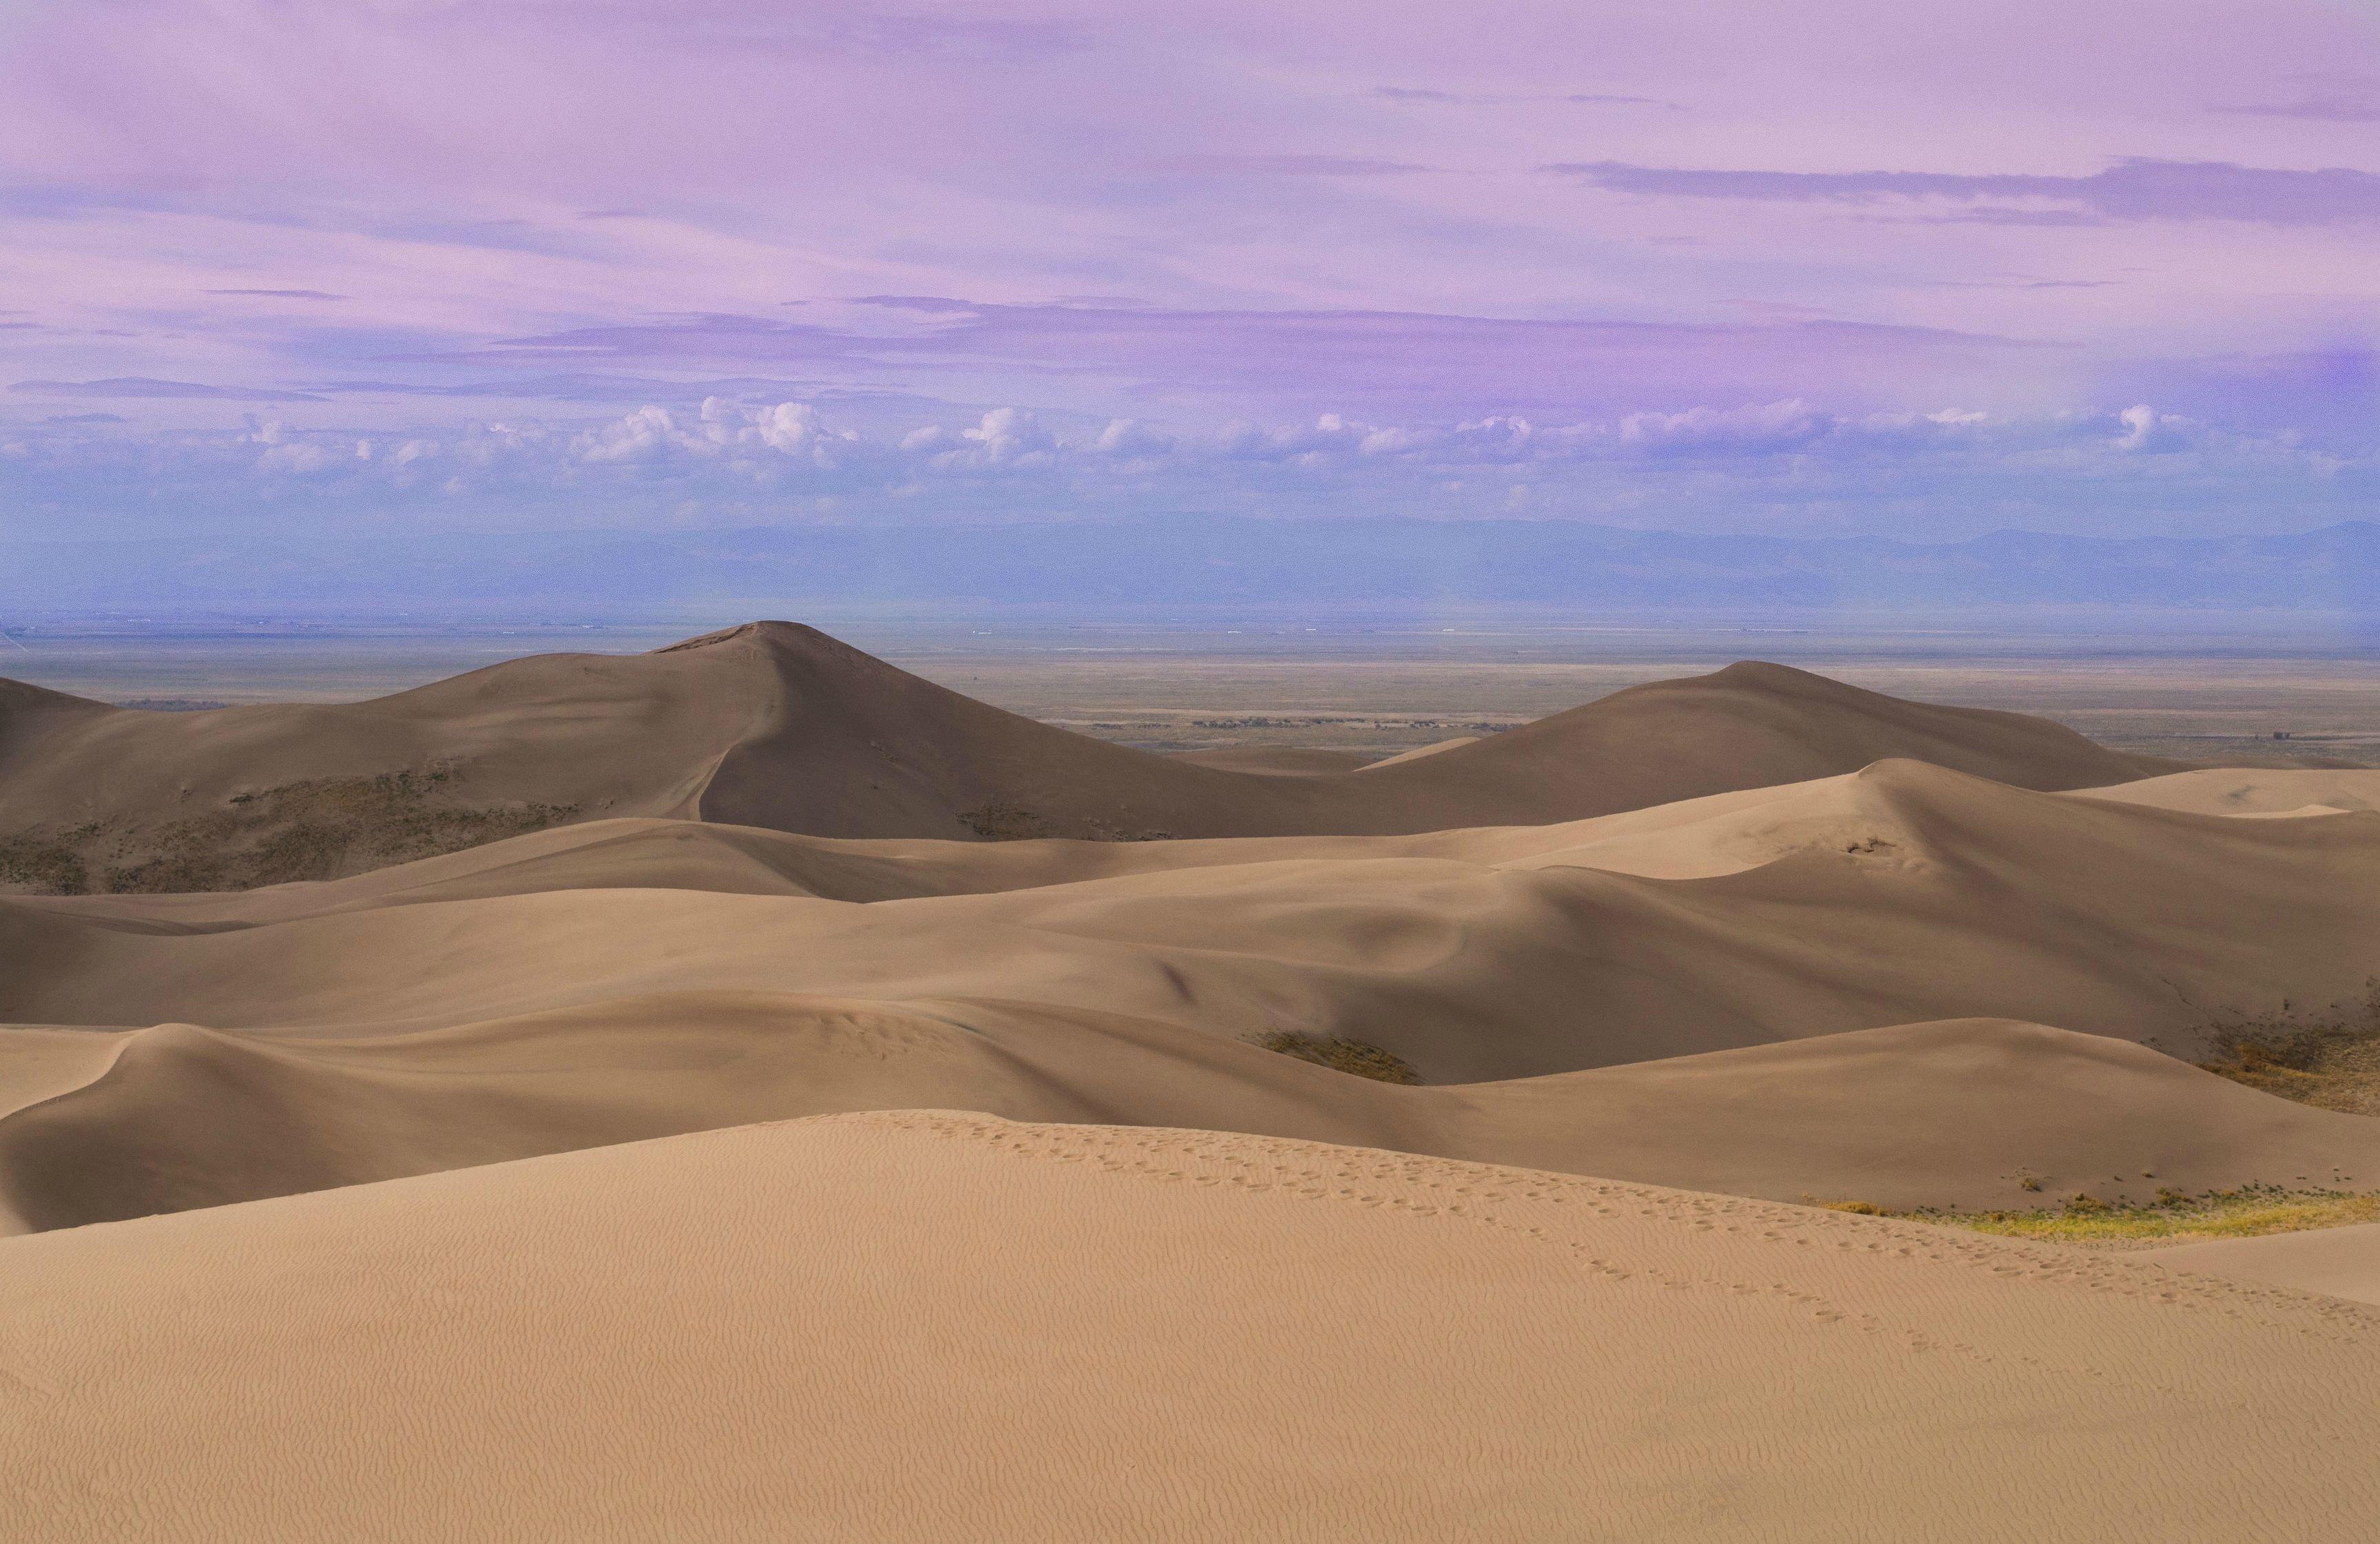 1920x1080 hd wallpaper dune - photo #40